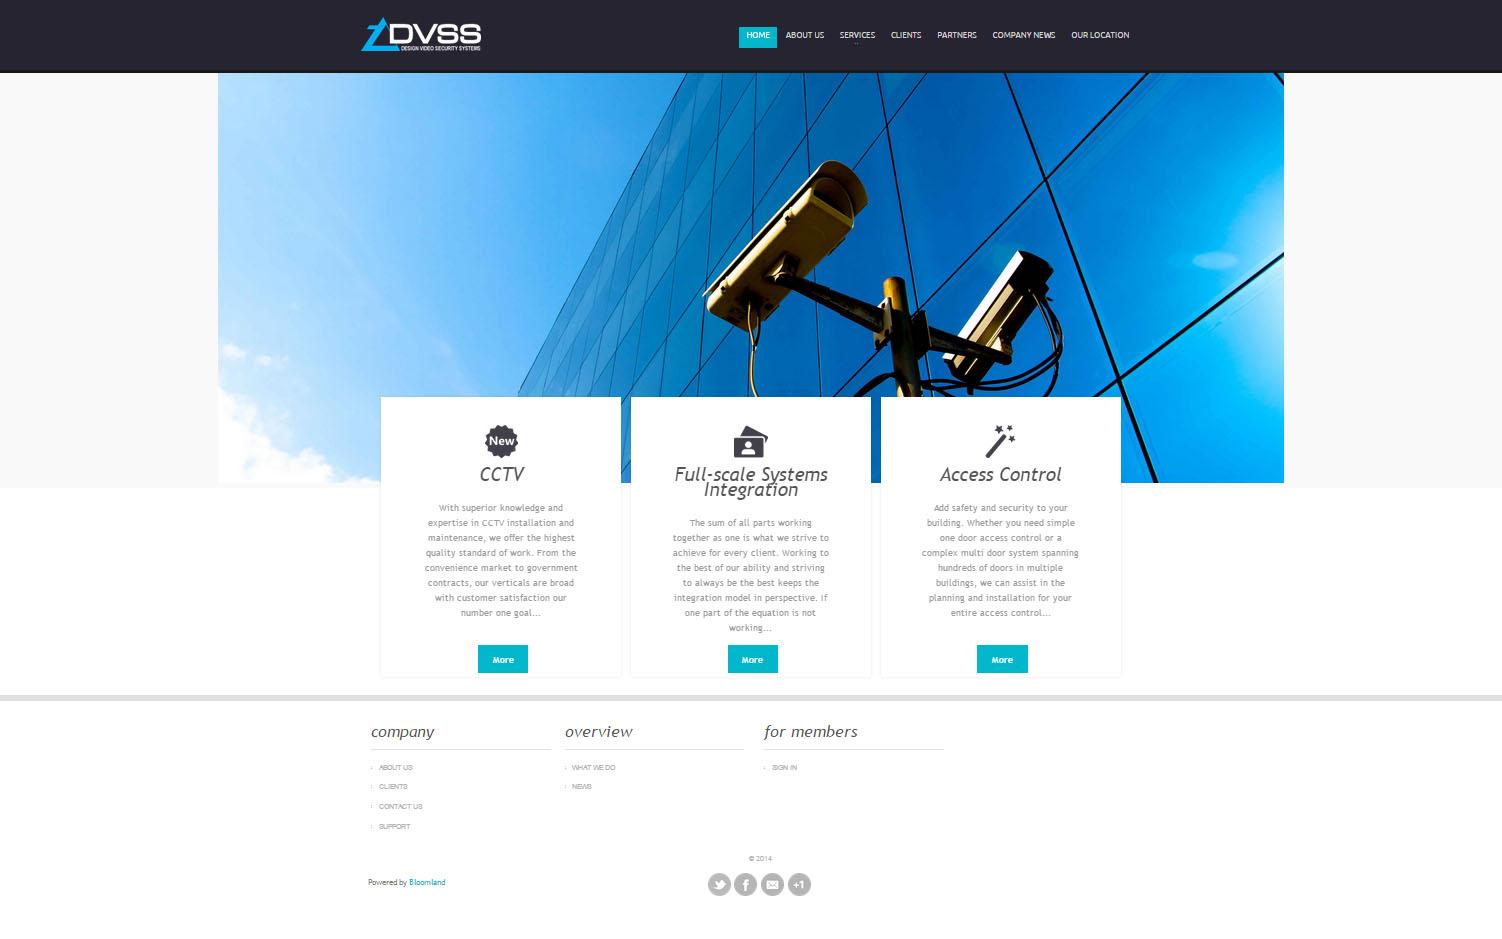 Web Design in Vancouver